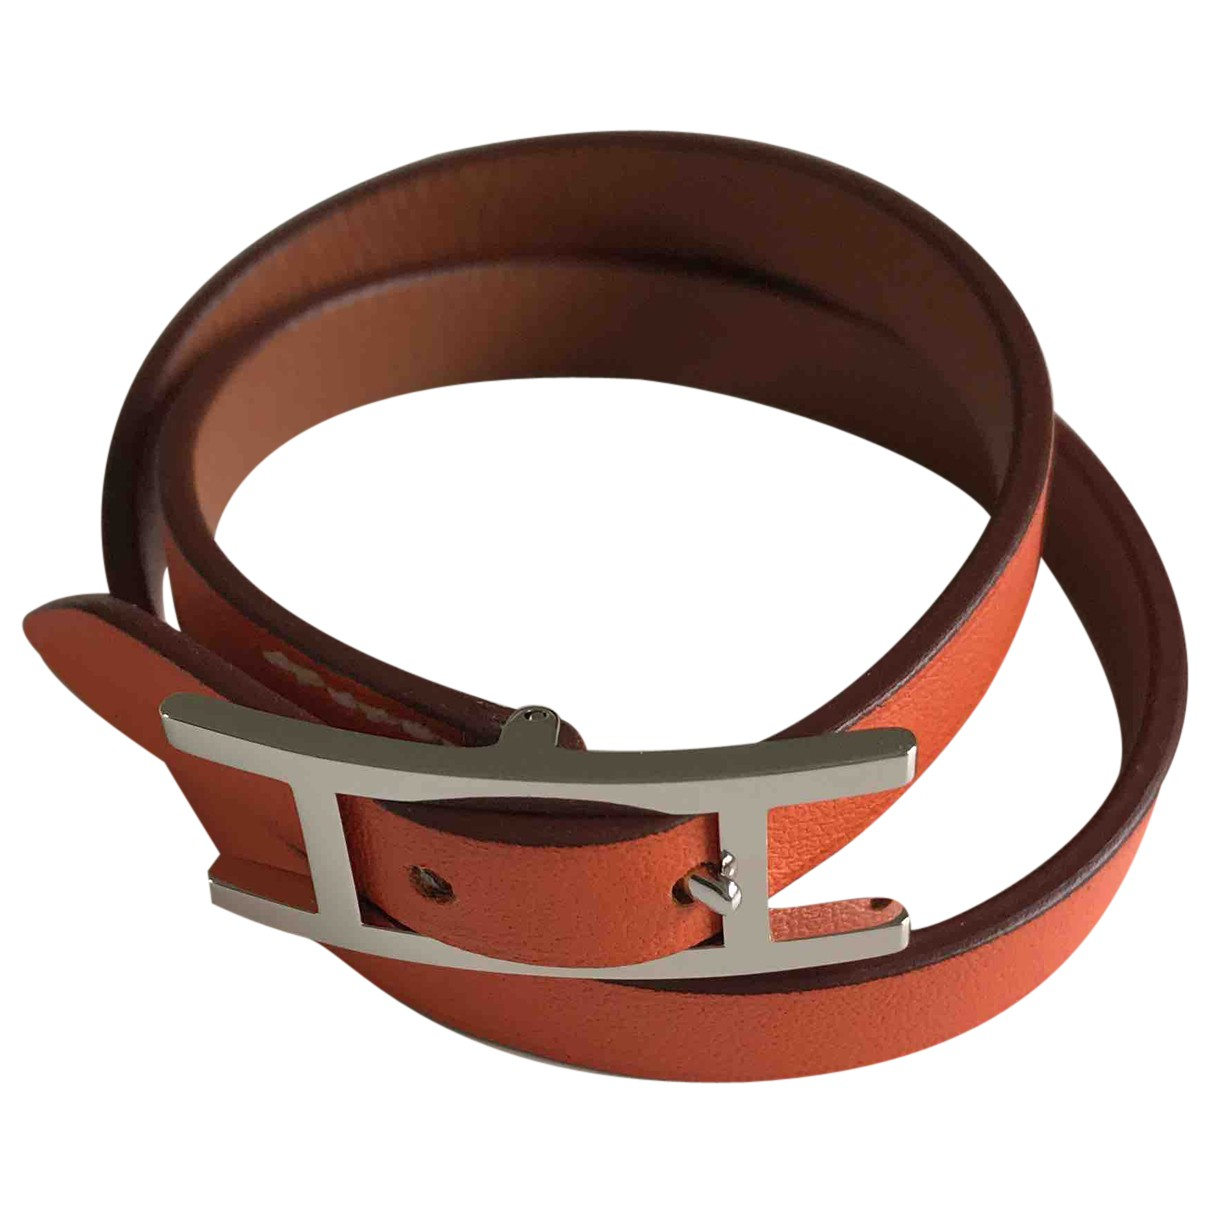 Hermes - Bracelet Hapi pour femme en cuir - orange